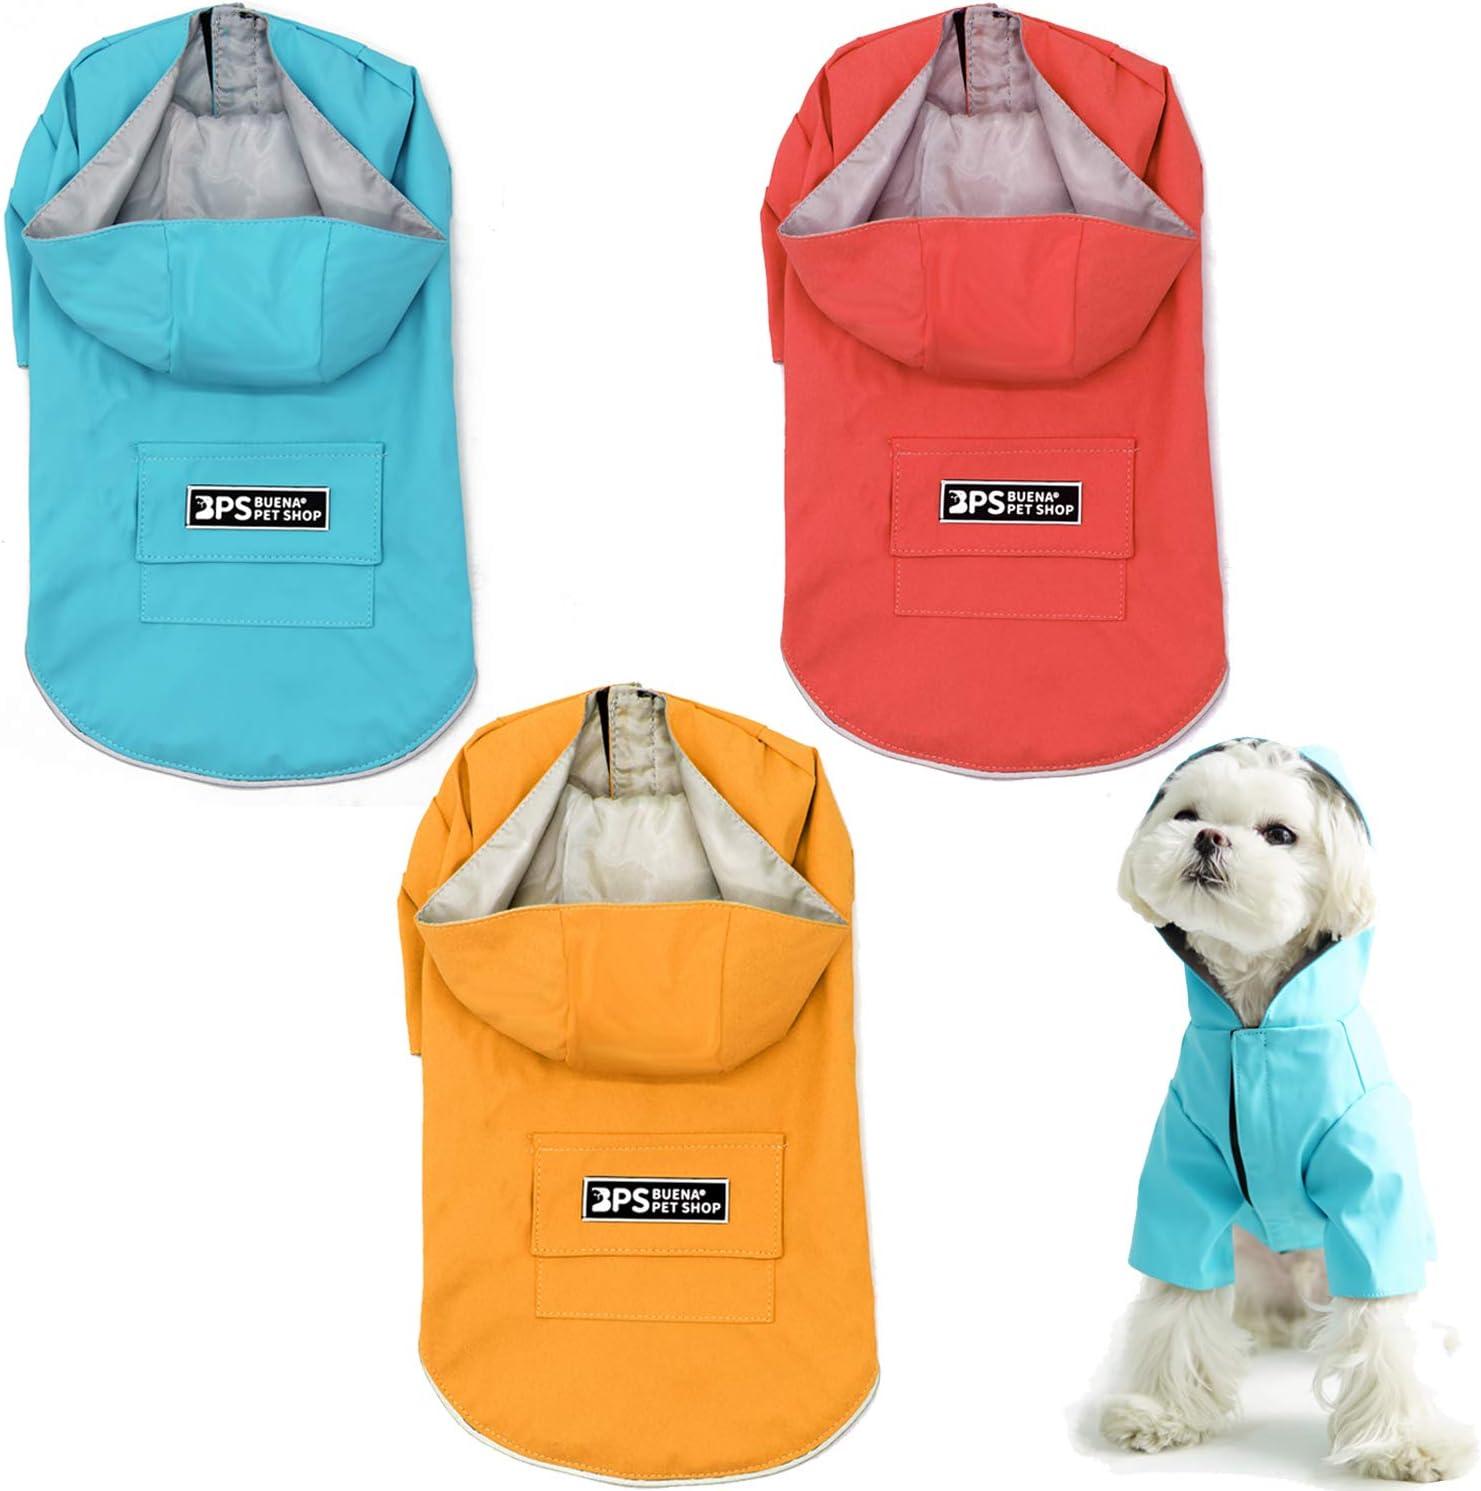 BPS Chubasqueros Impermeables para Mascotas Perros Impermeables con Capucha Bolsillo para Perro Pequeño Mediano y Grande con Material 100% Poliéster (XXL, Amarillo) BPS-9704AM